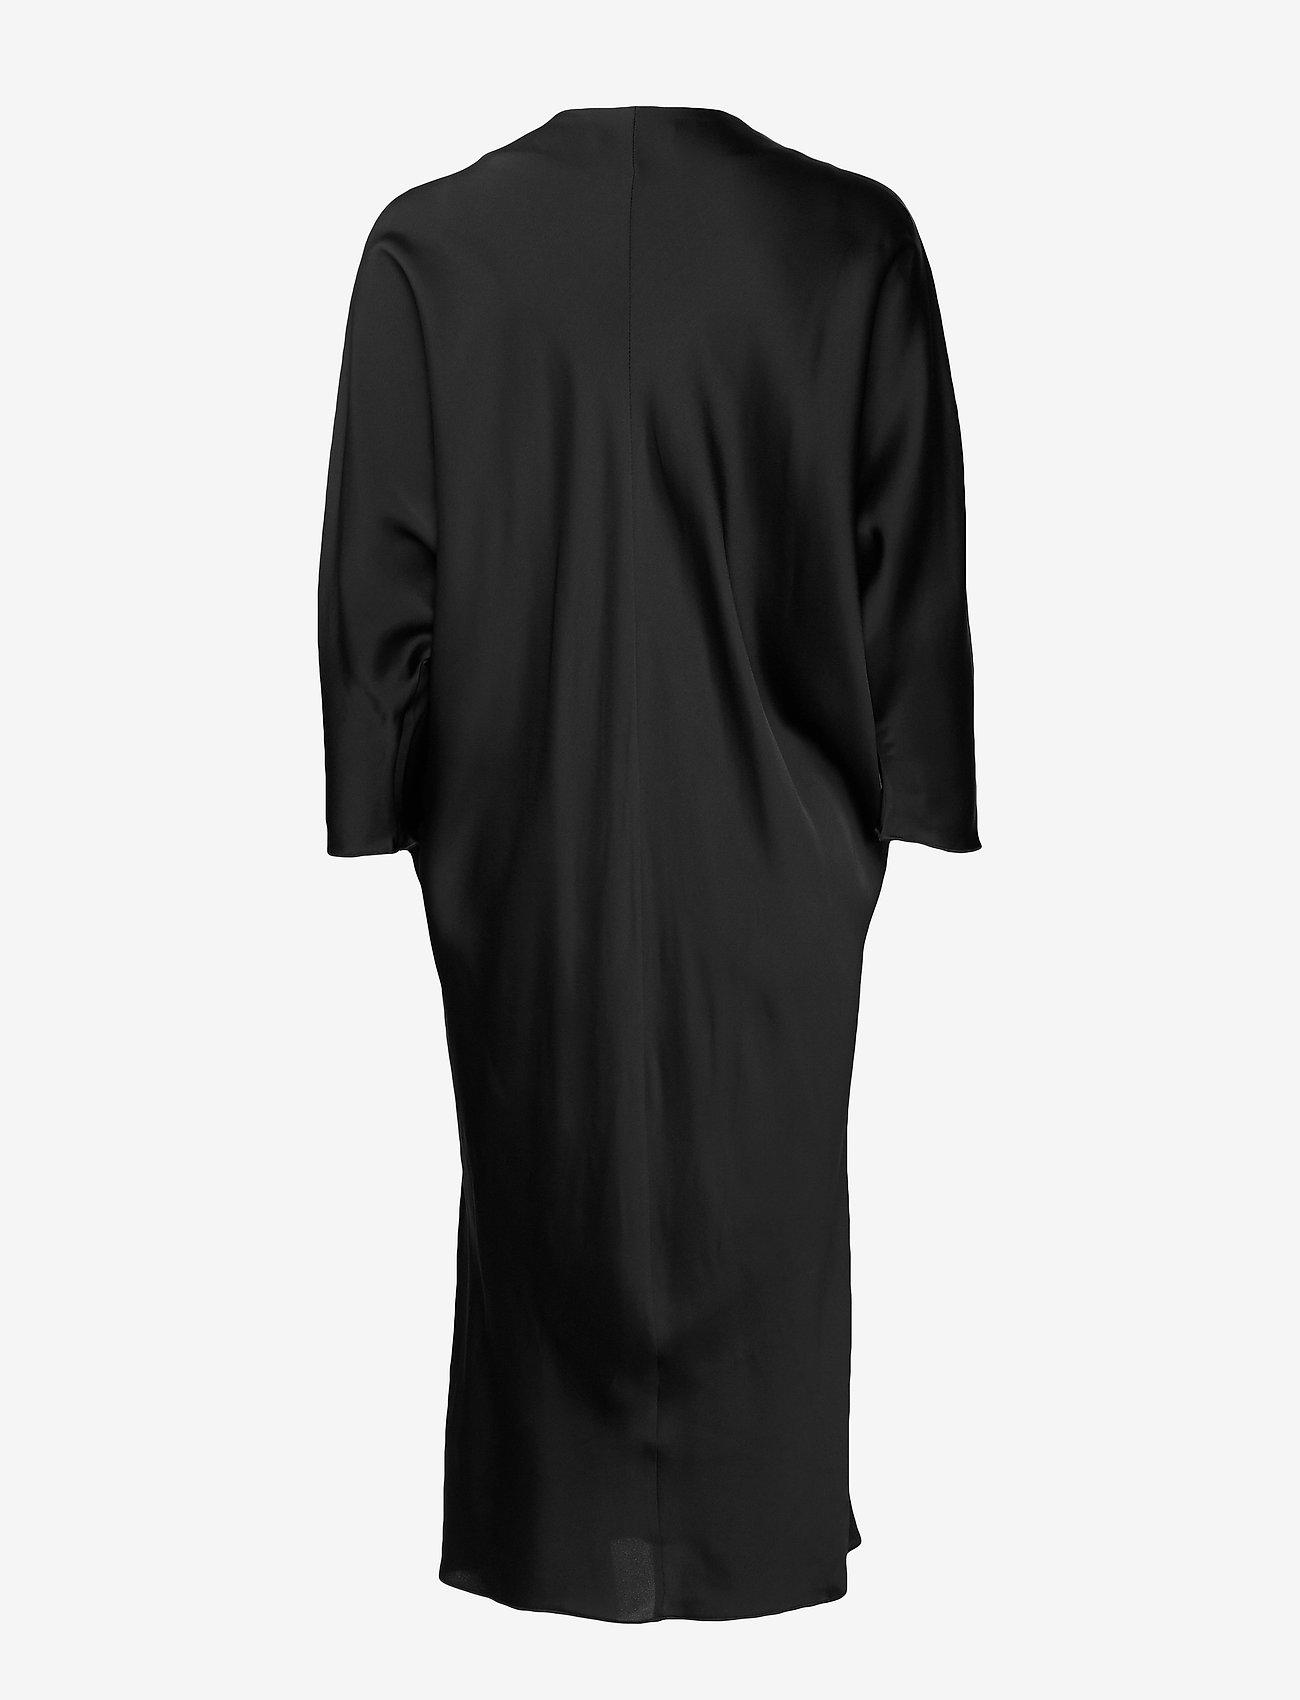 Fly Dress (Black) - Hope QHWi8h